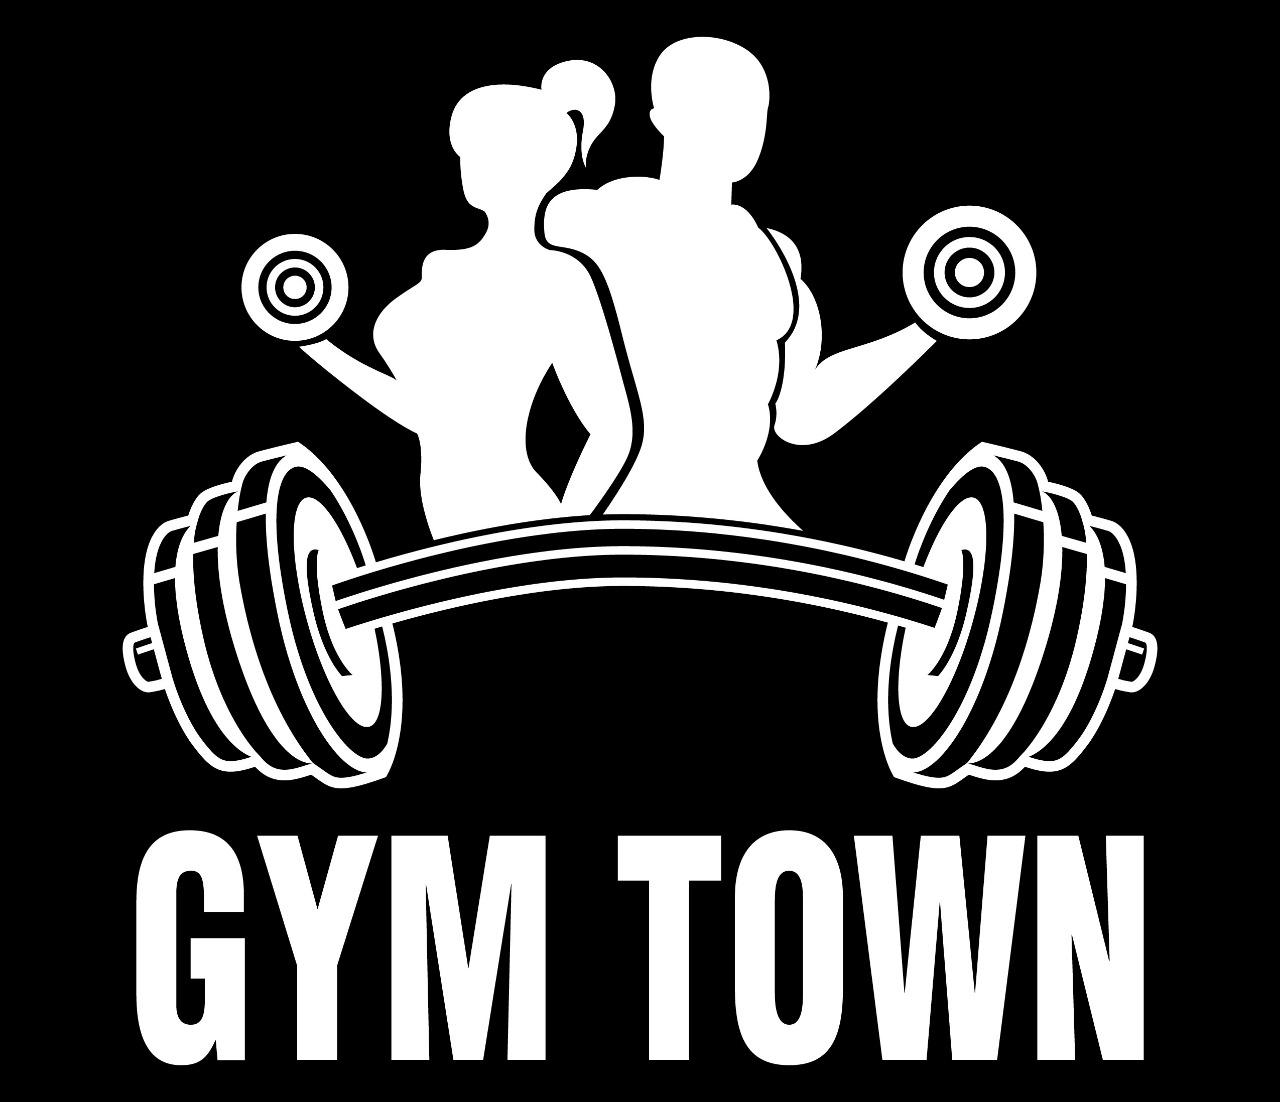 Gym Town Wakad